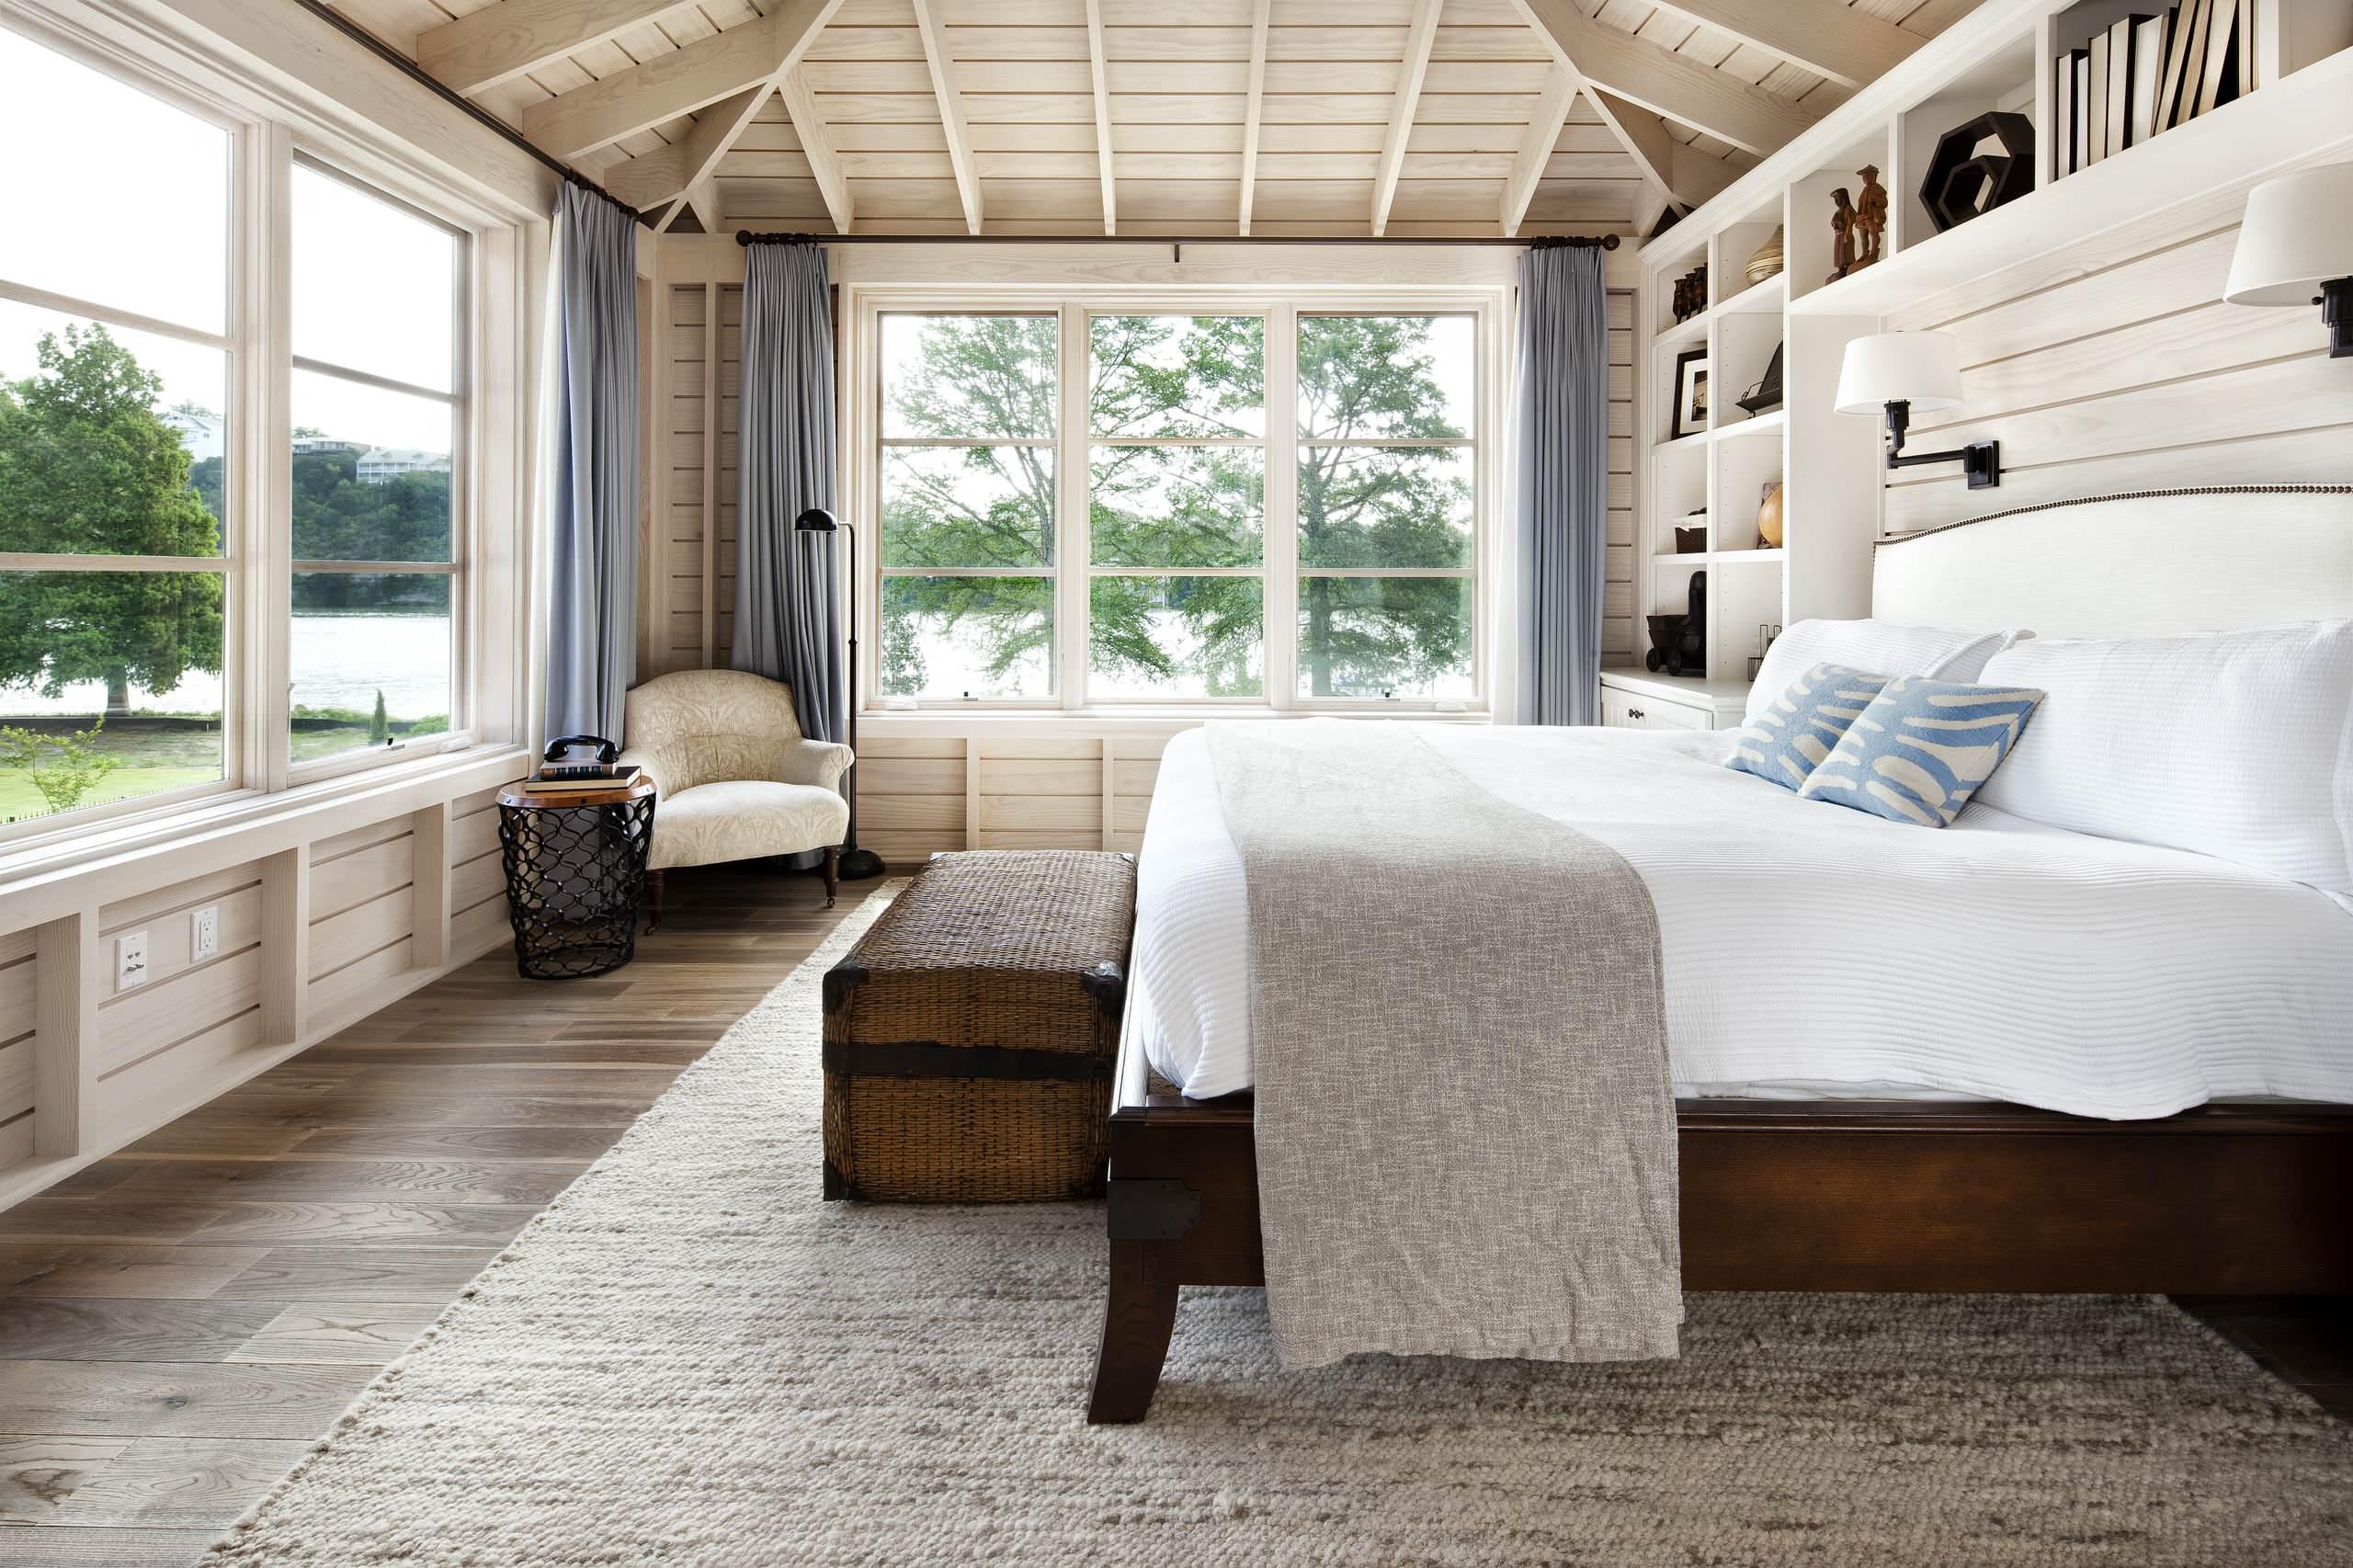 Bedroom Decoration Tips- Well Ventilated Bedroom